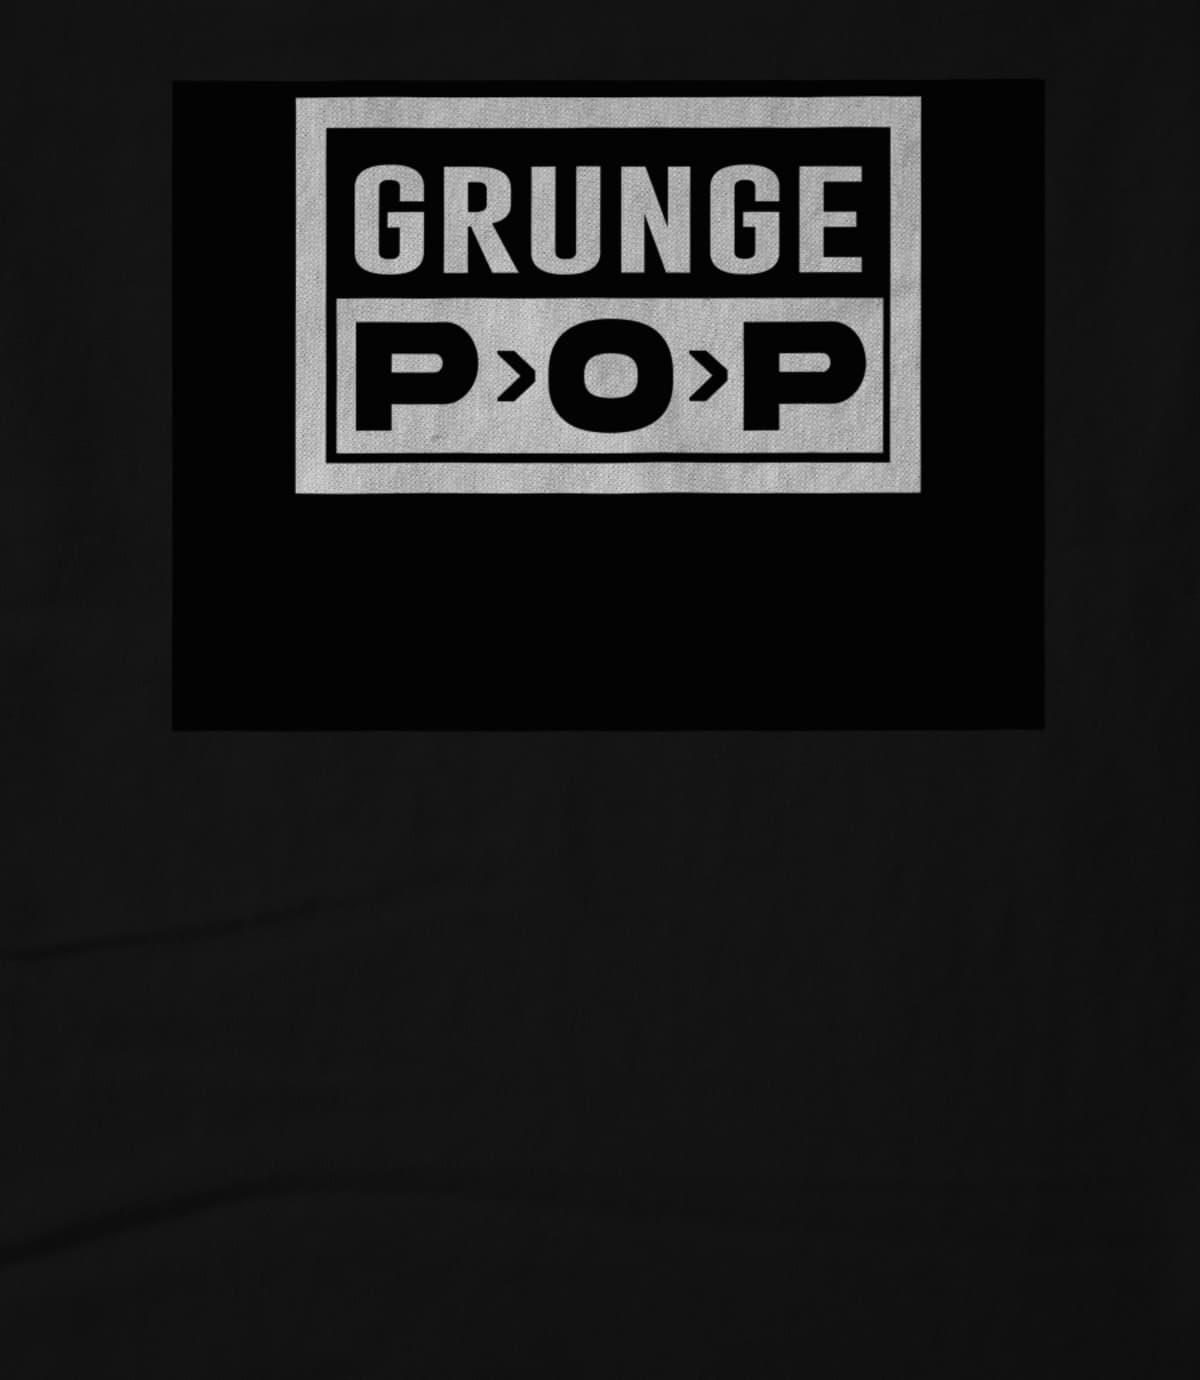 GRUNGE POP RECORDS